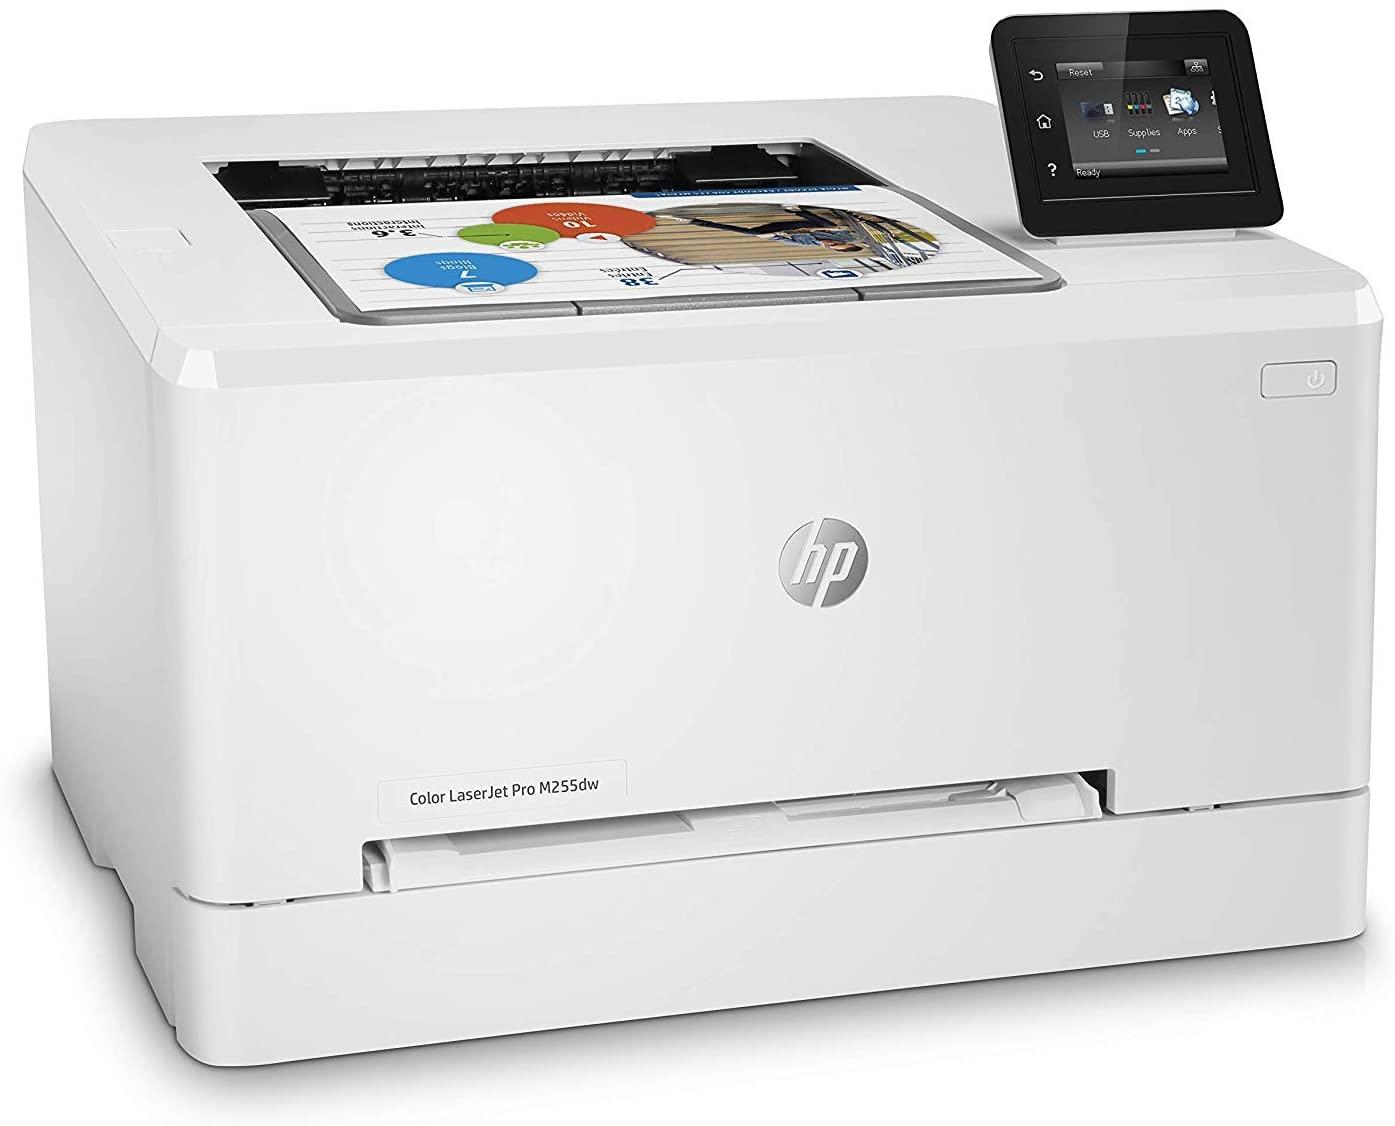 Impresora láser a color HP Color LaserJet Pro M255dw con WiFi